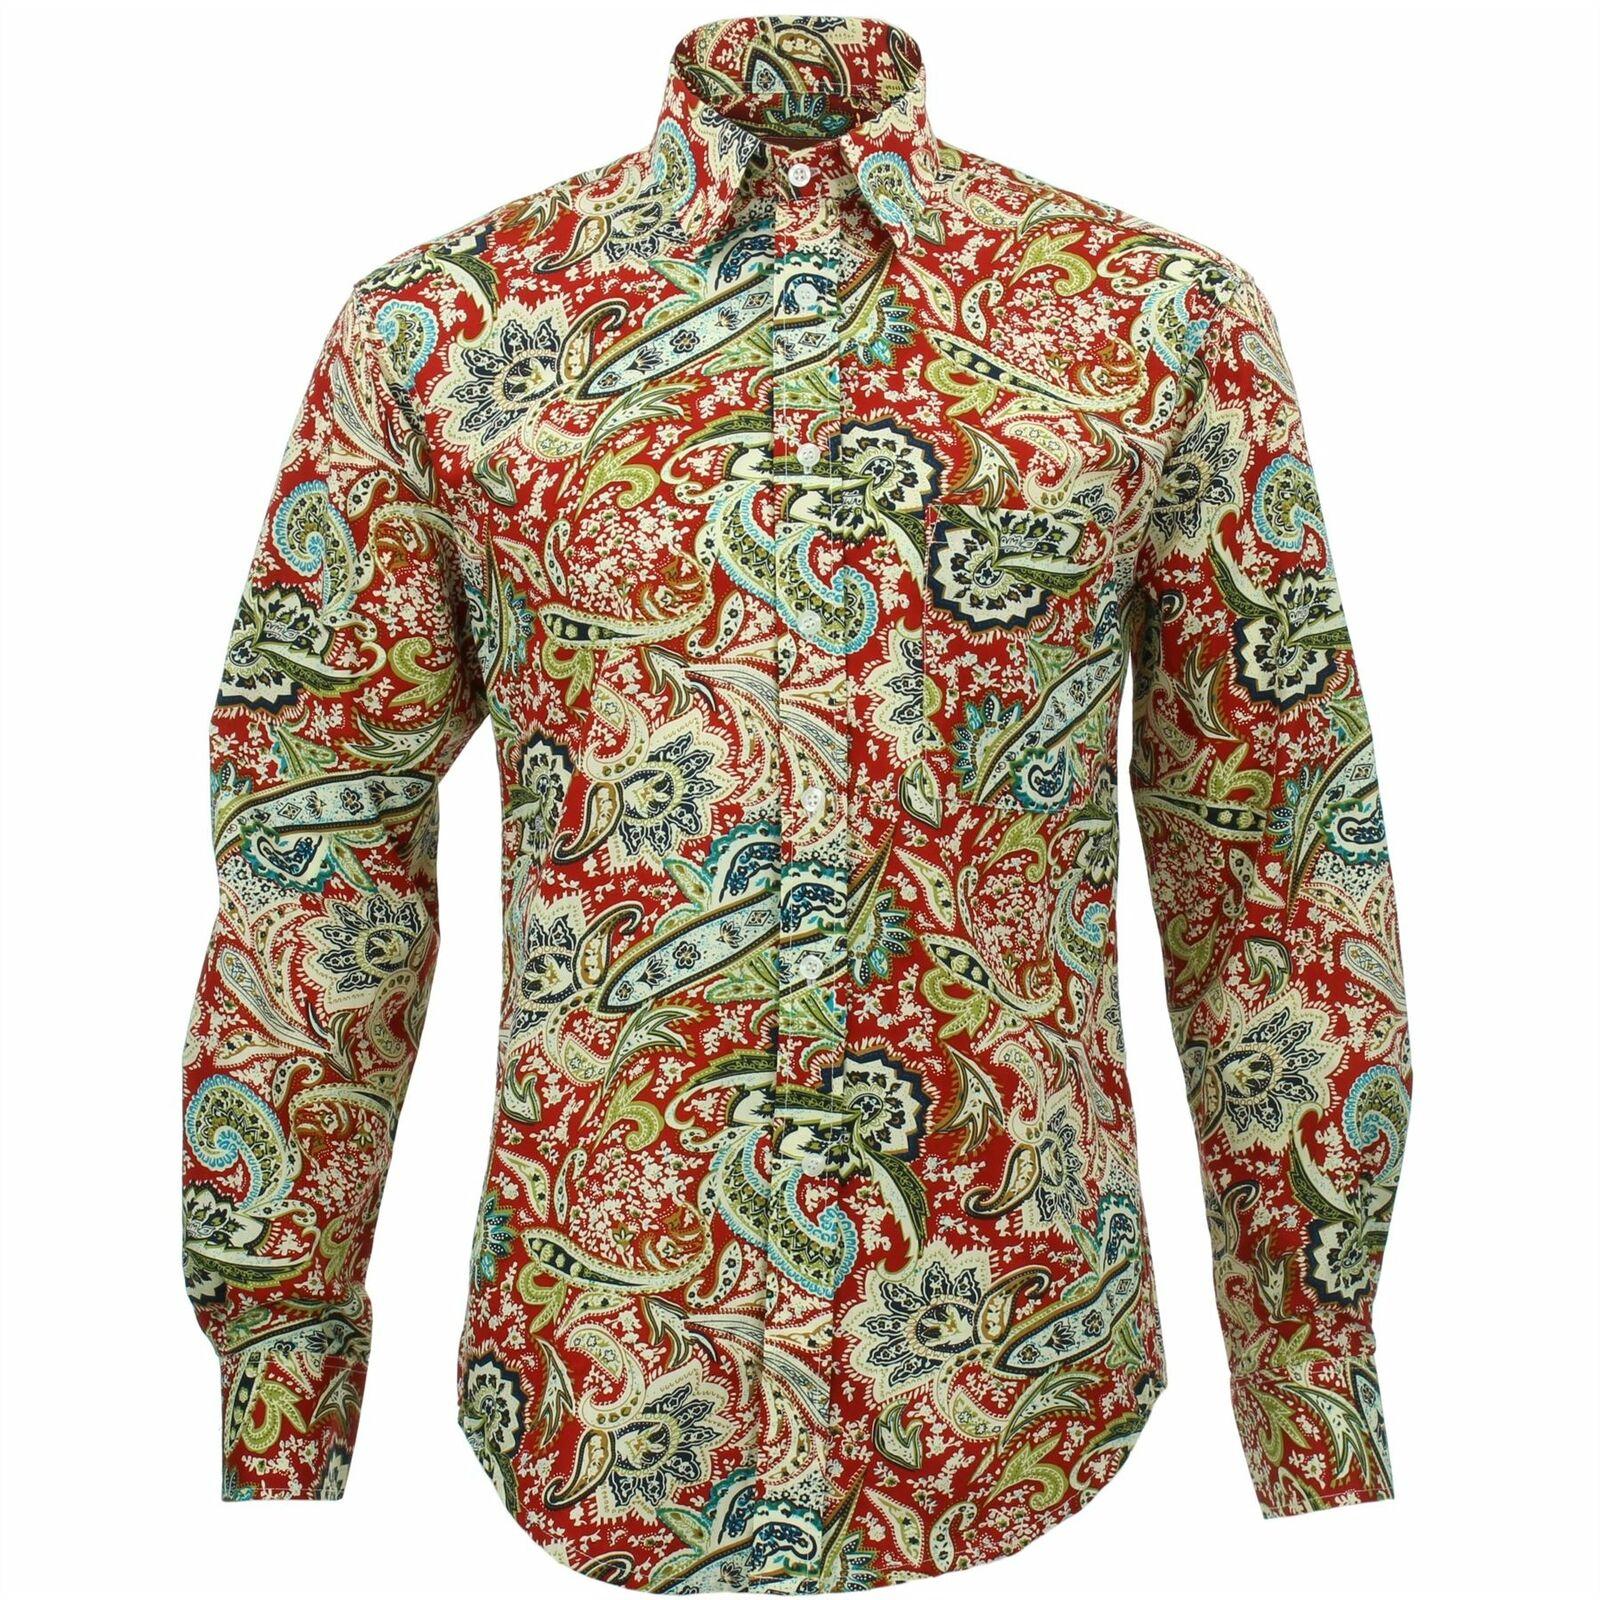 Herren Shirt Loud Originals Regular Fit Paisley Rot Retro Psychedelic Kostüm | Elegante Form